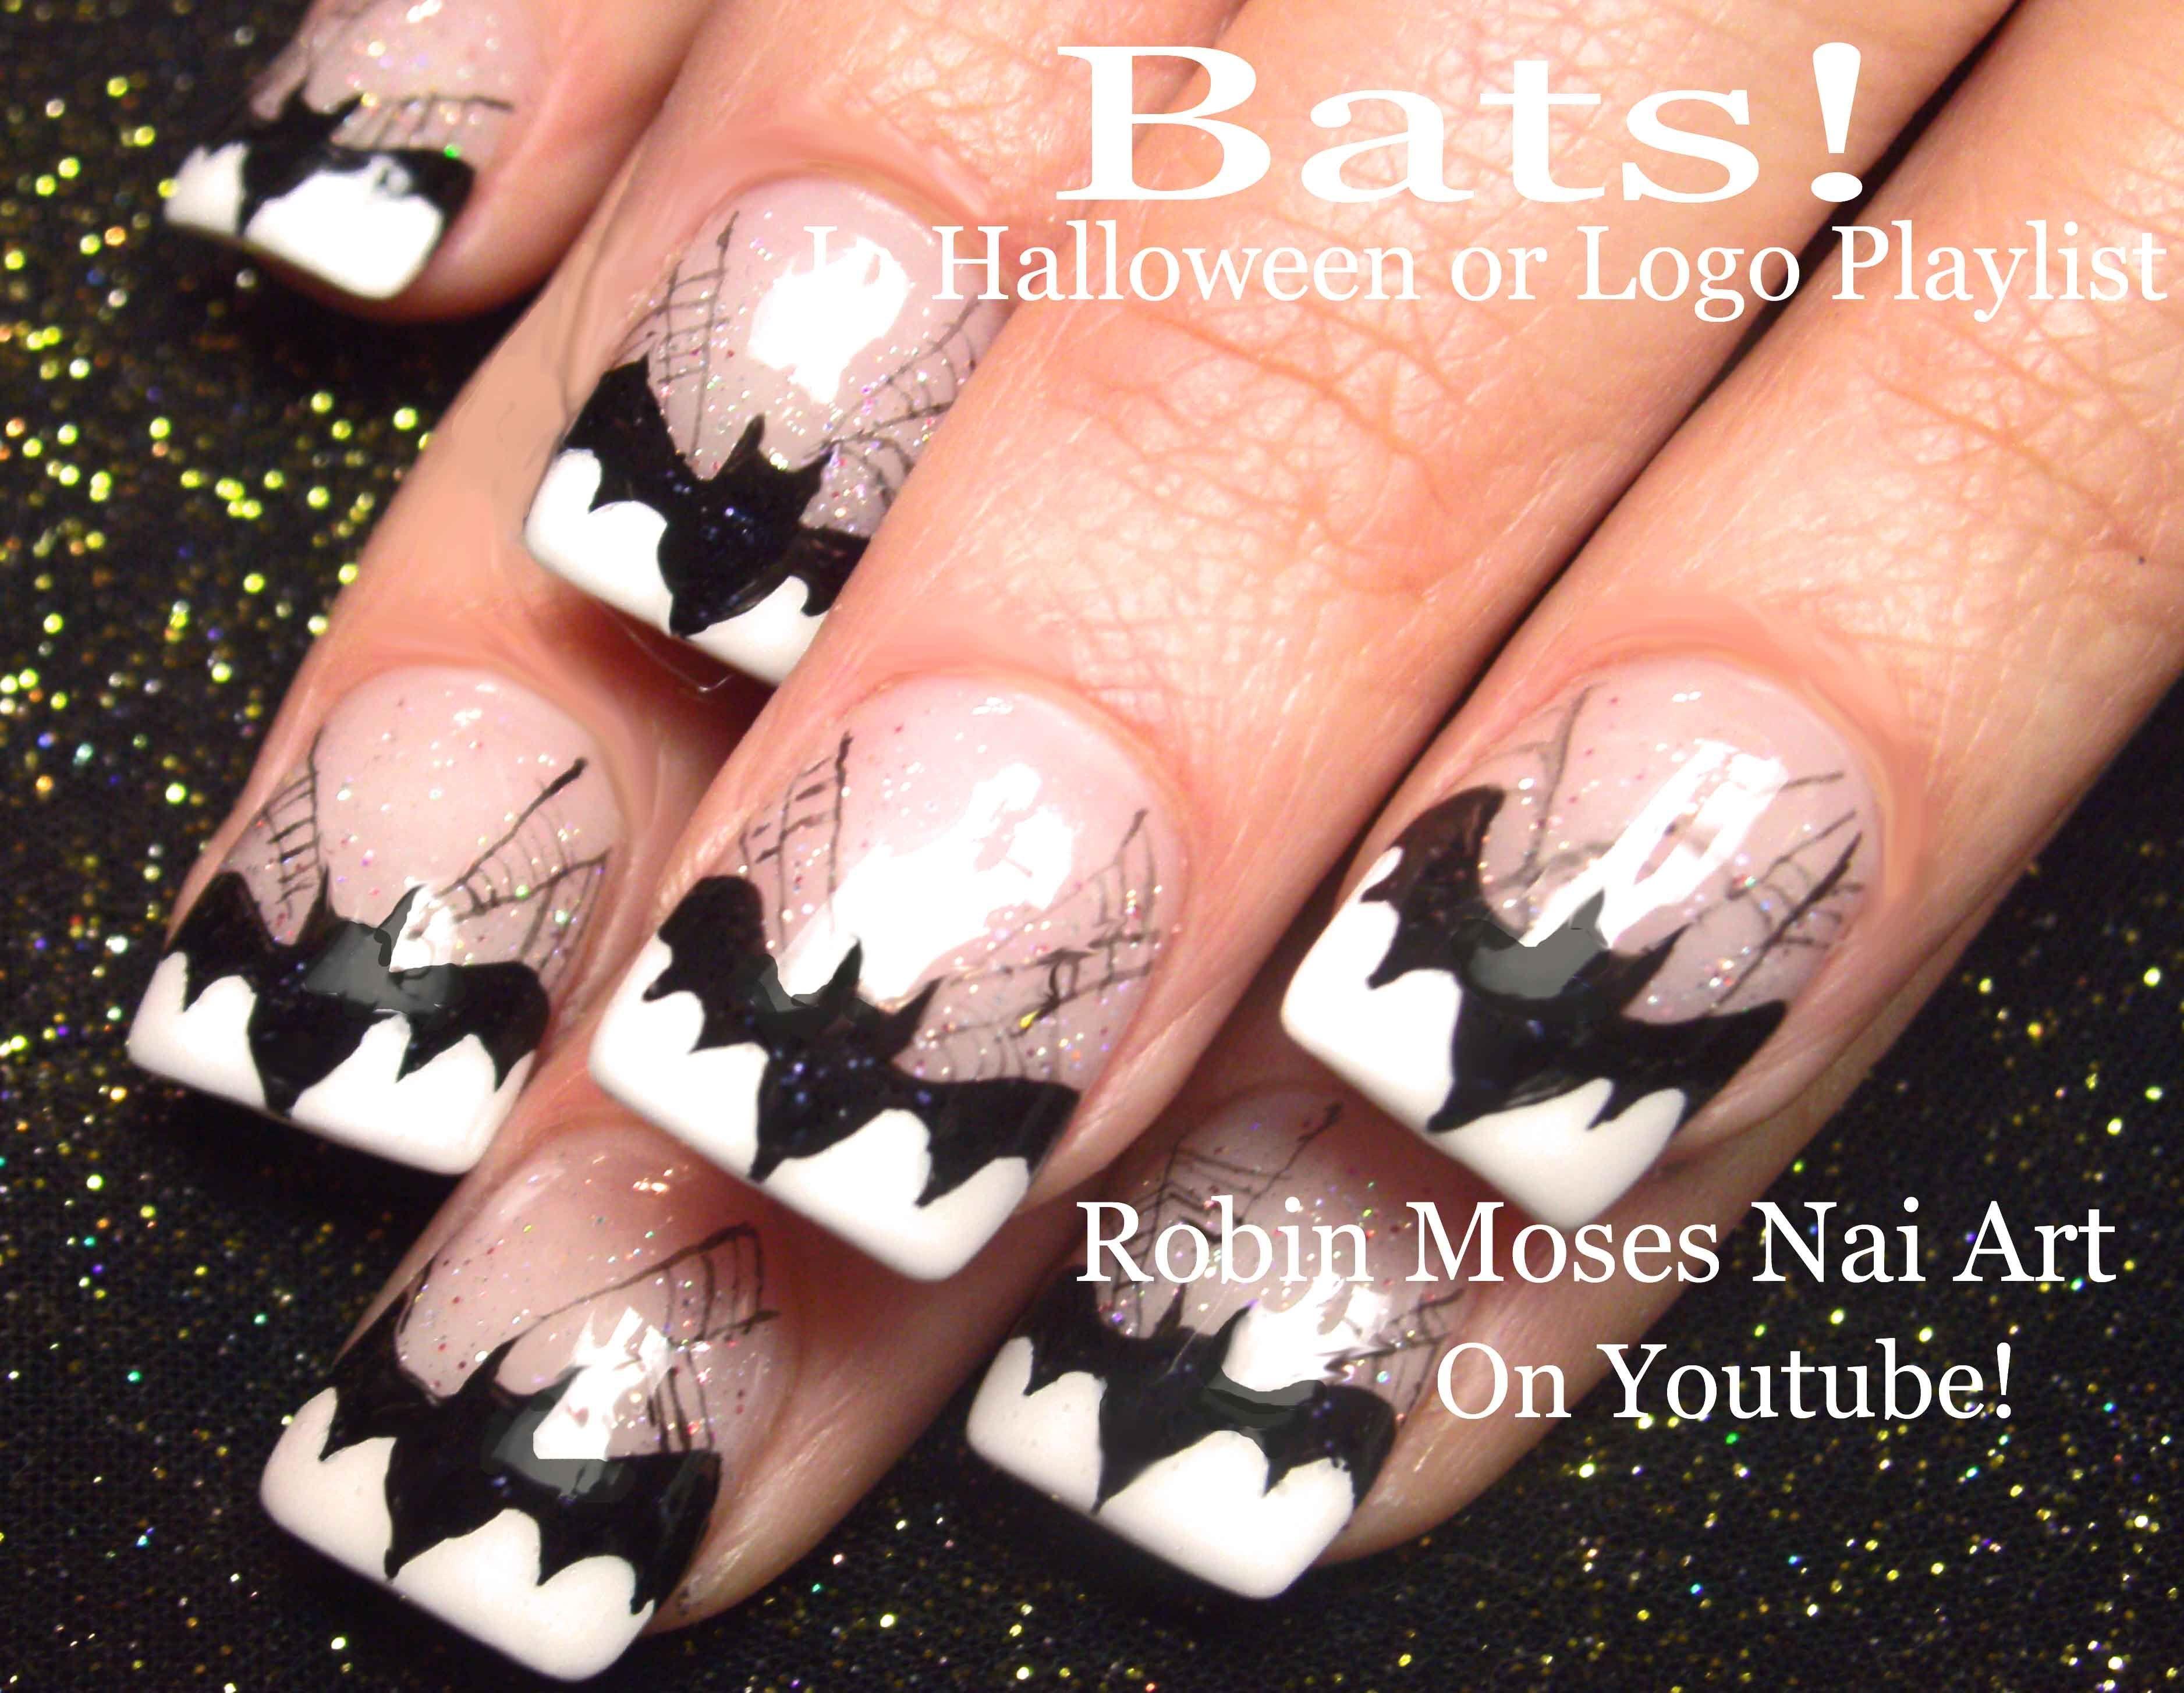 Nail Art | Halloween Nails with Bats and Spiderweb Nail Design ...